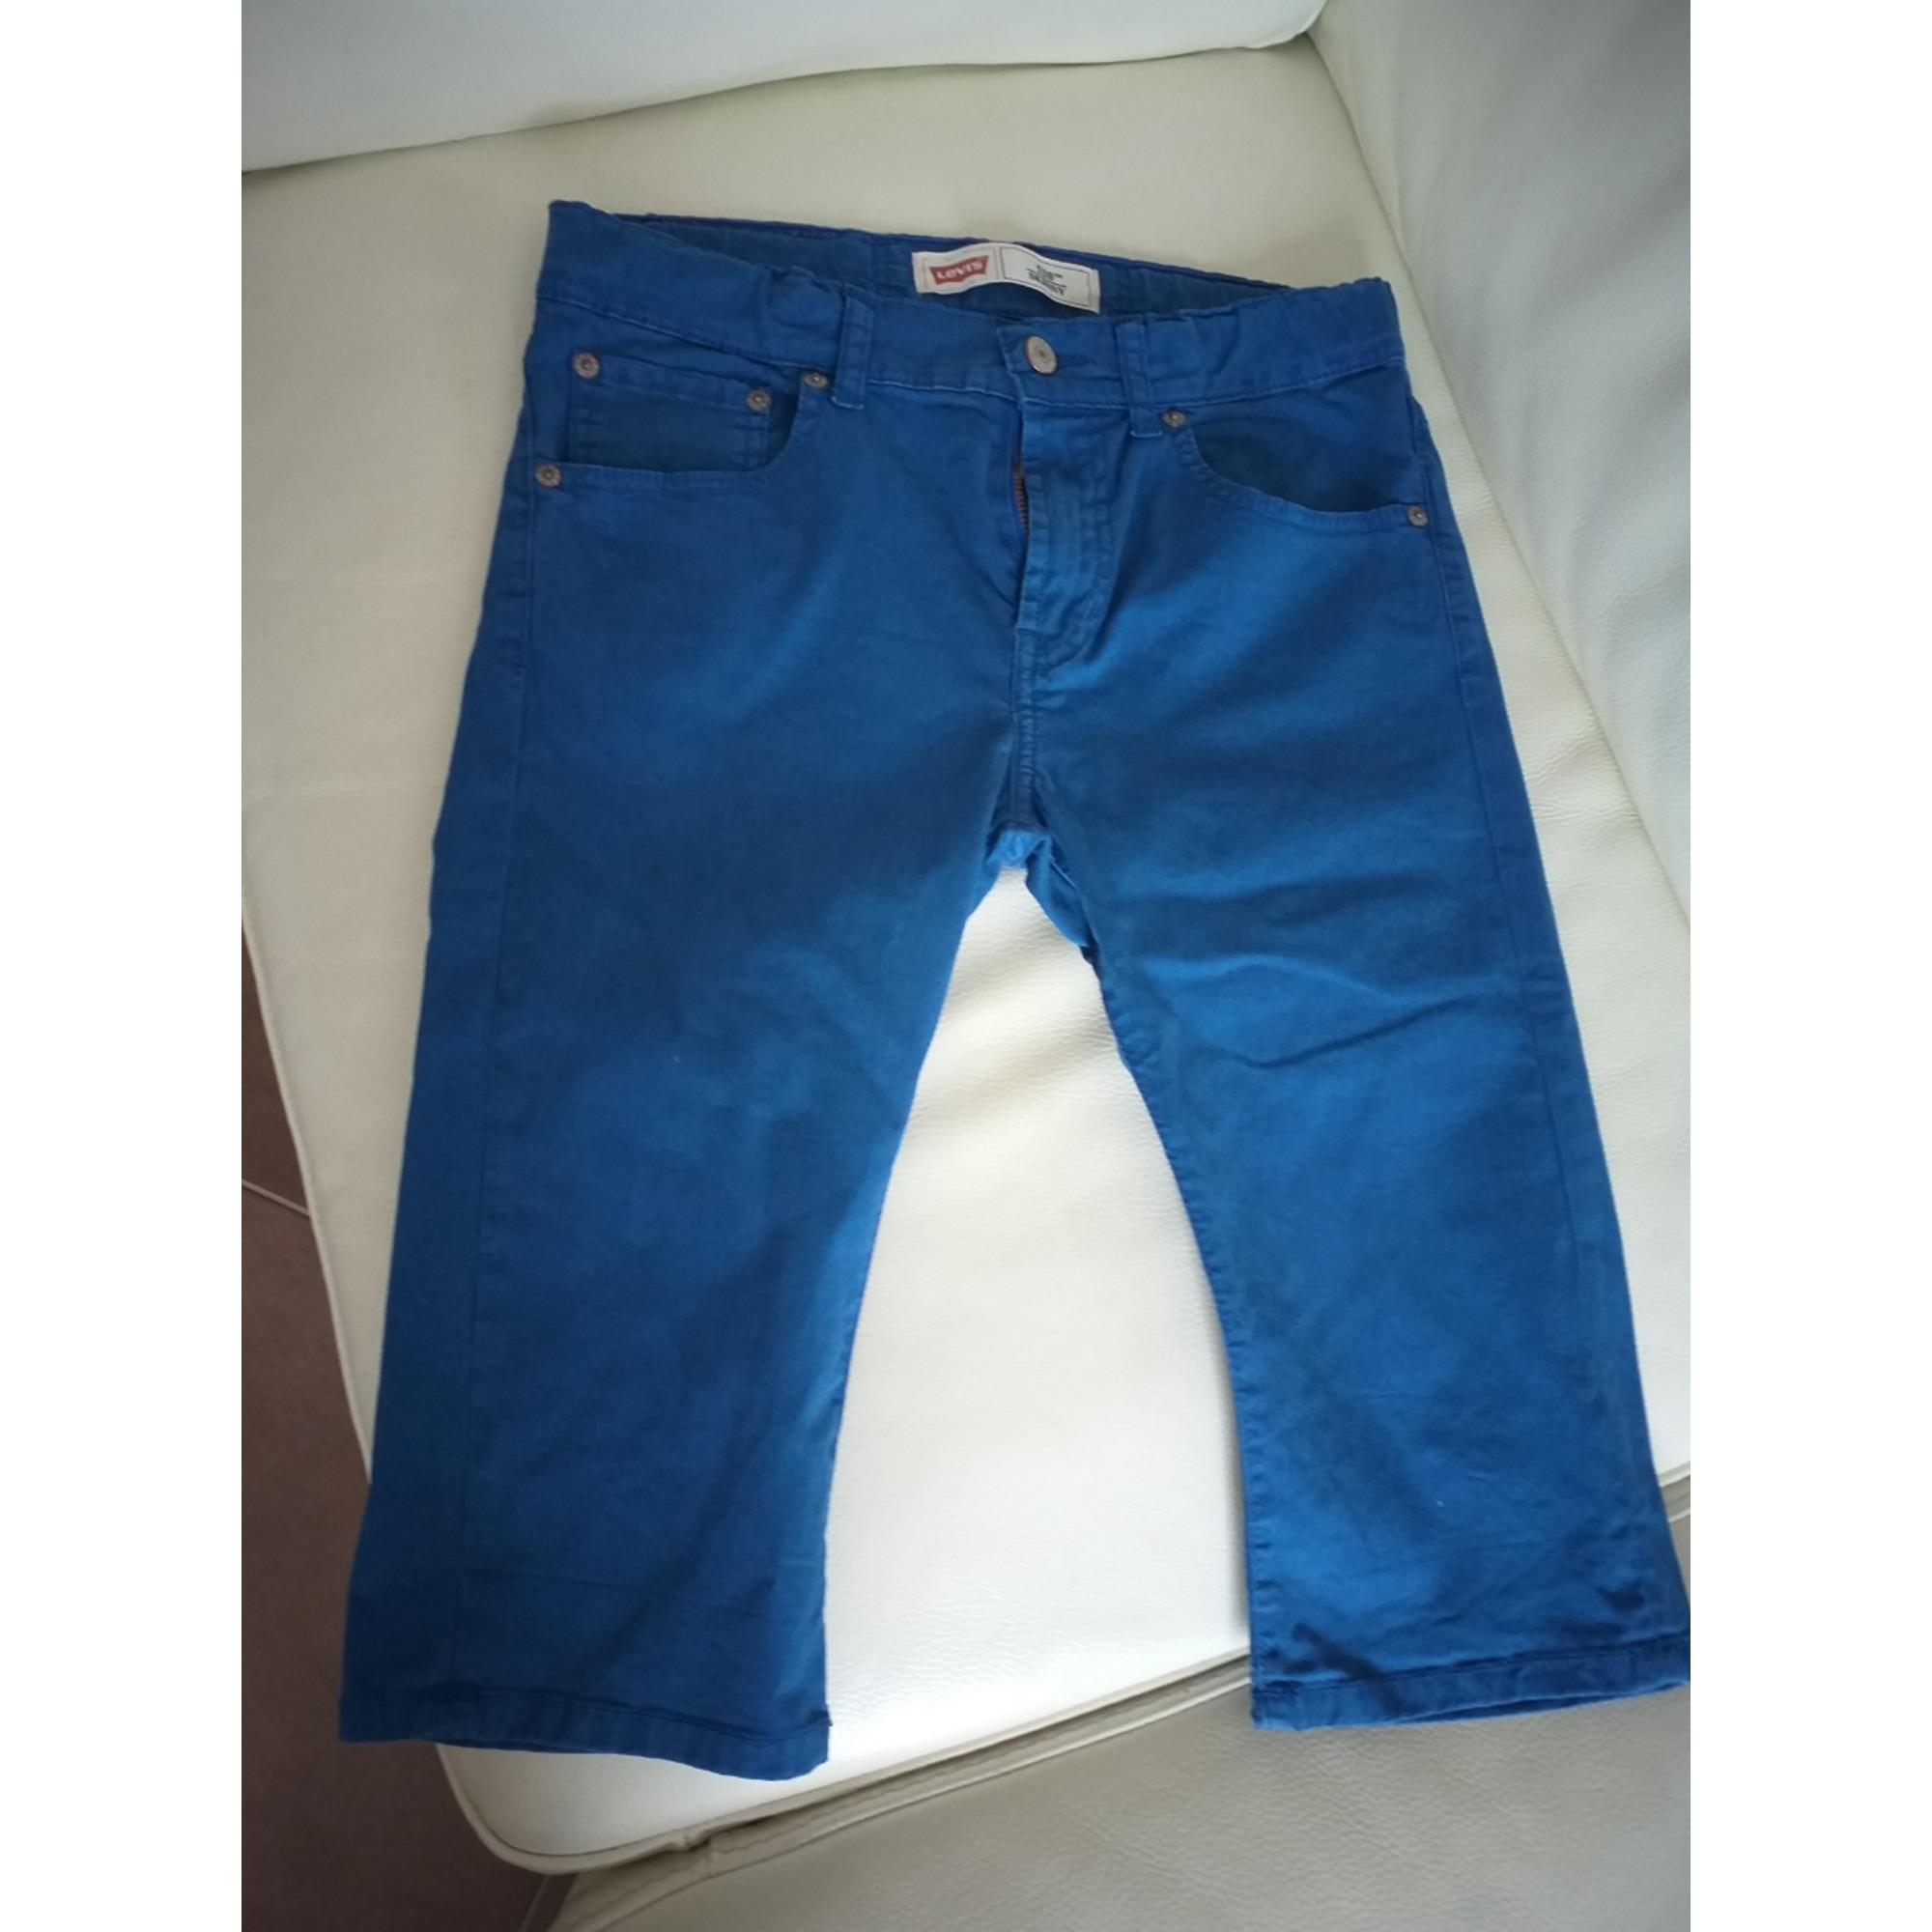 Bermuda LEVI'S Bleu, bleu marine, bleu turquoise